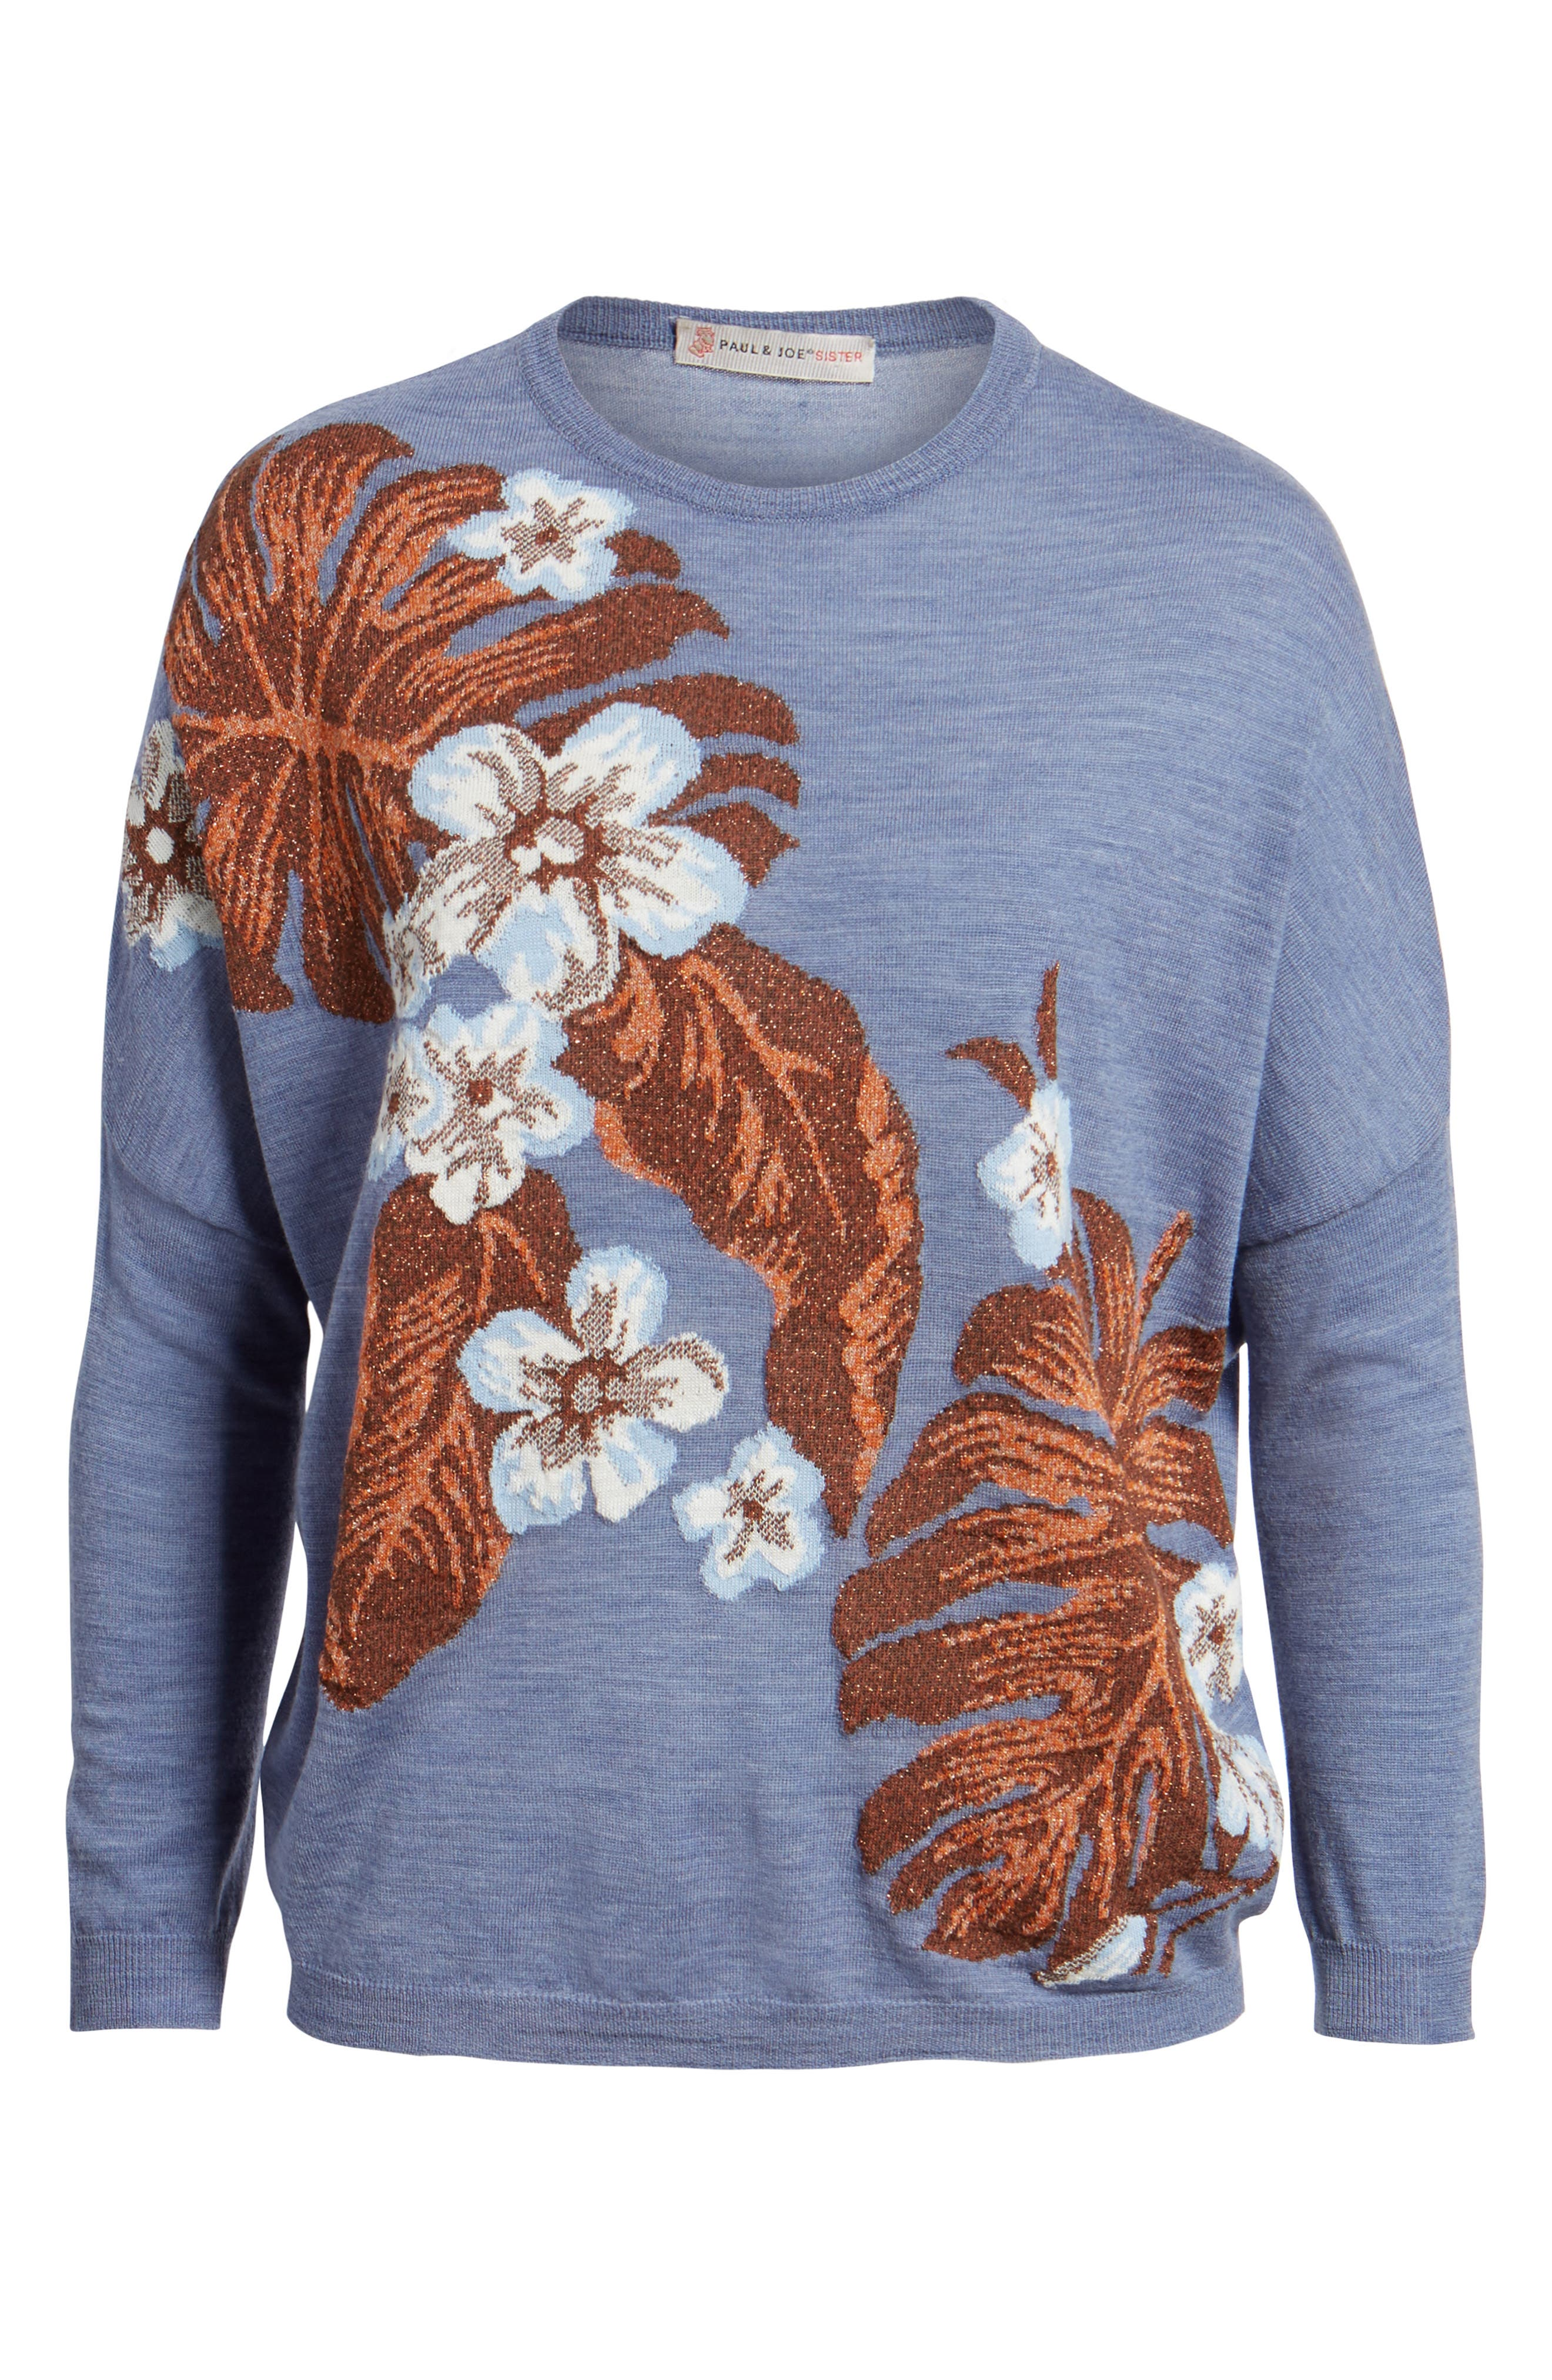 Blupalm Sweater,                             Alternate thumbnail 6, color,                             Denim